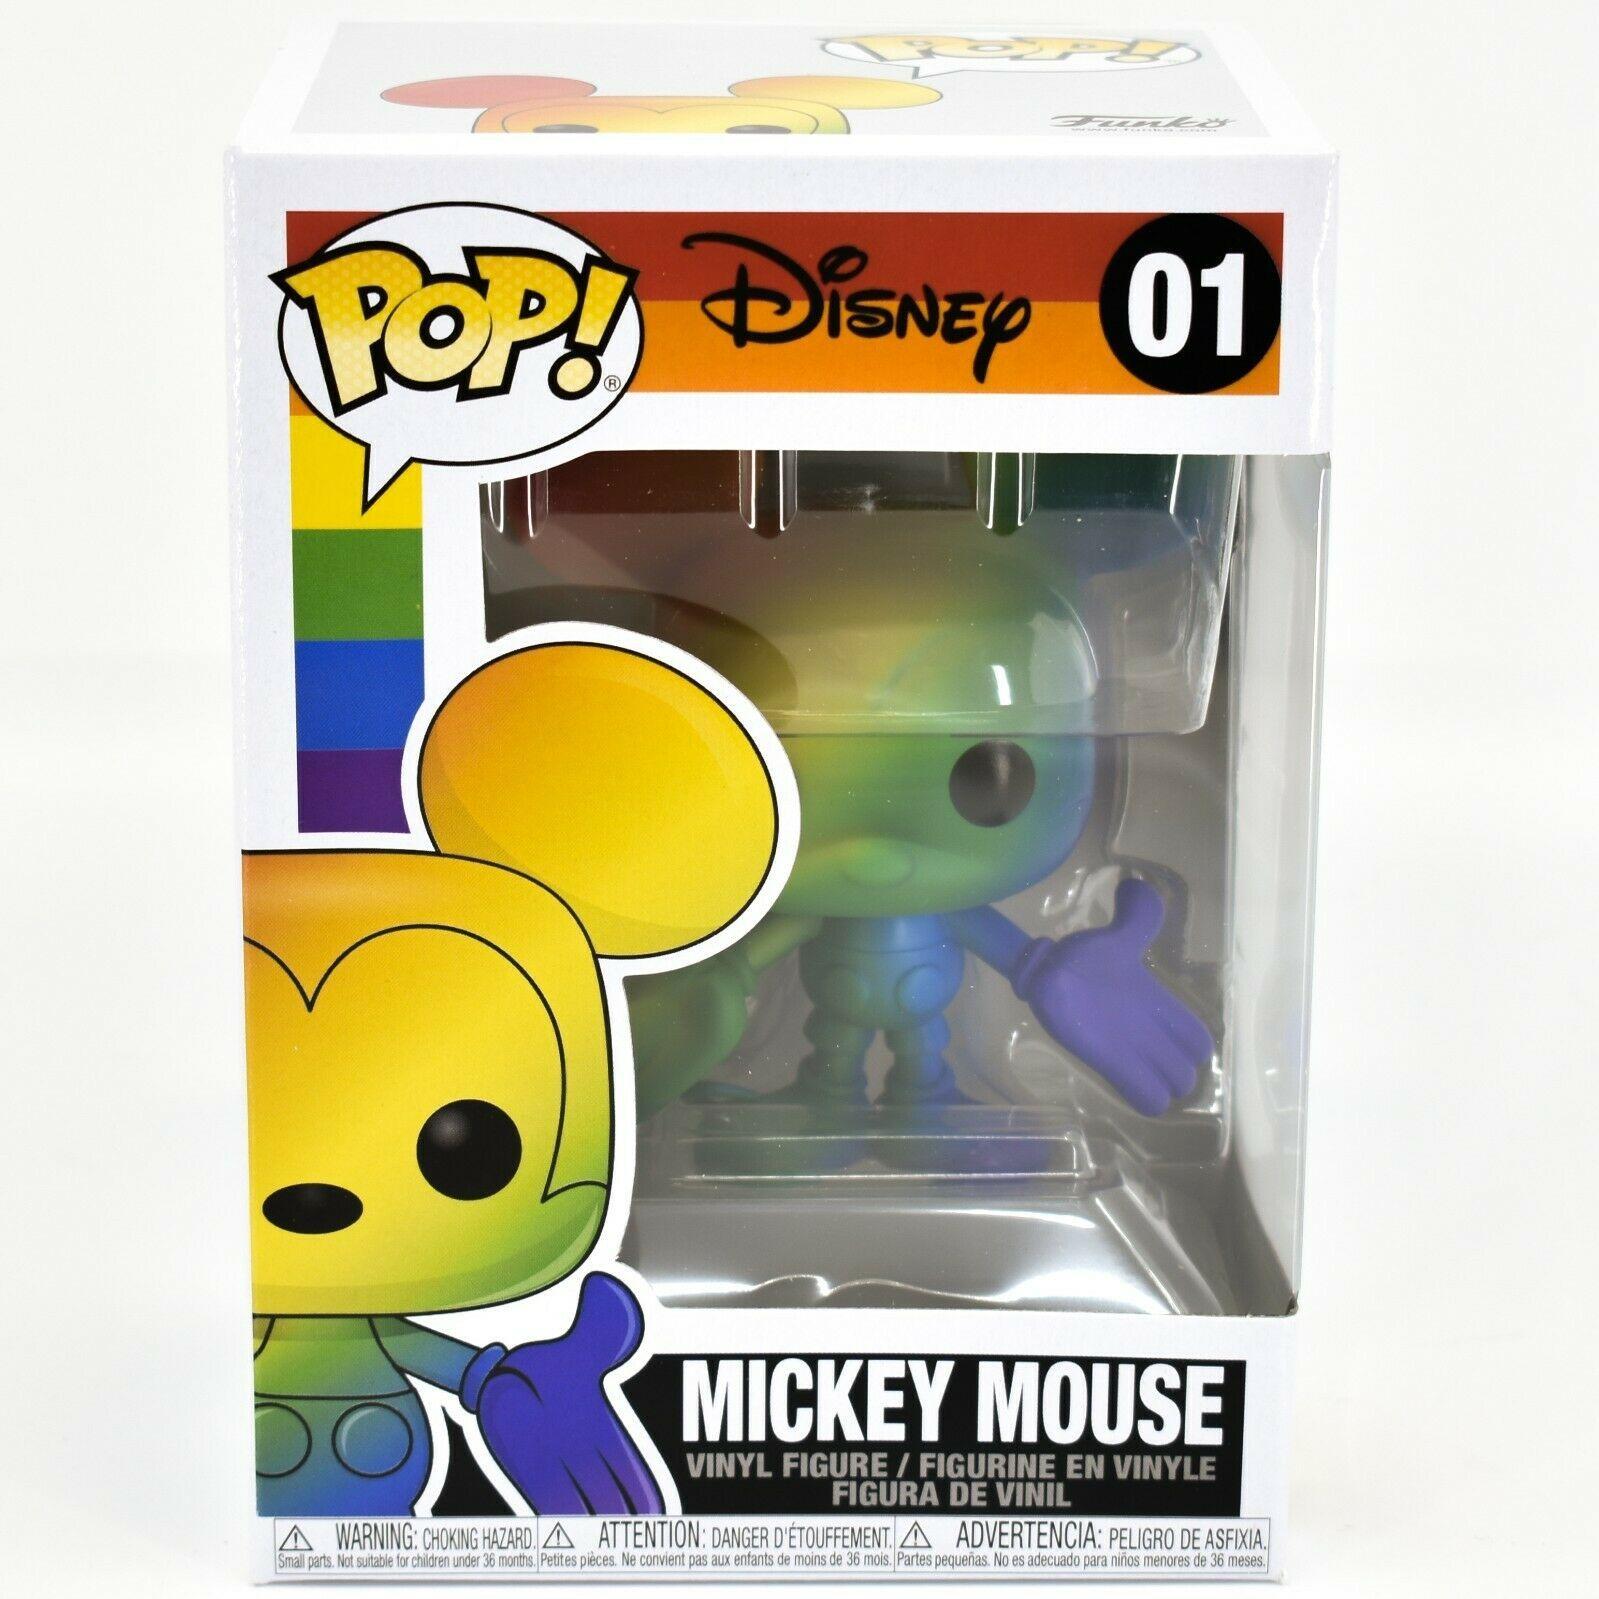 Funko Pop! Disney Pride 2021 Rainbow Mickey Mouse #01 Figure